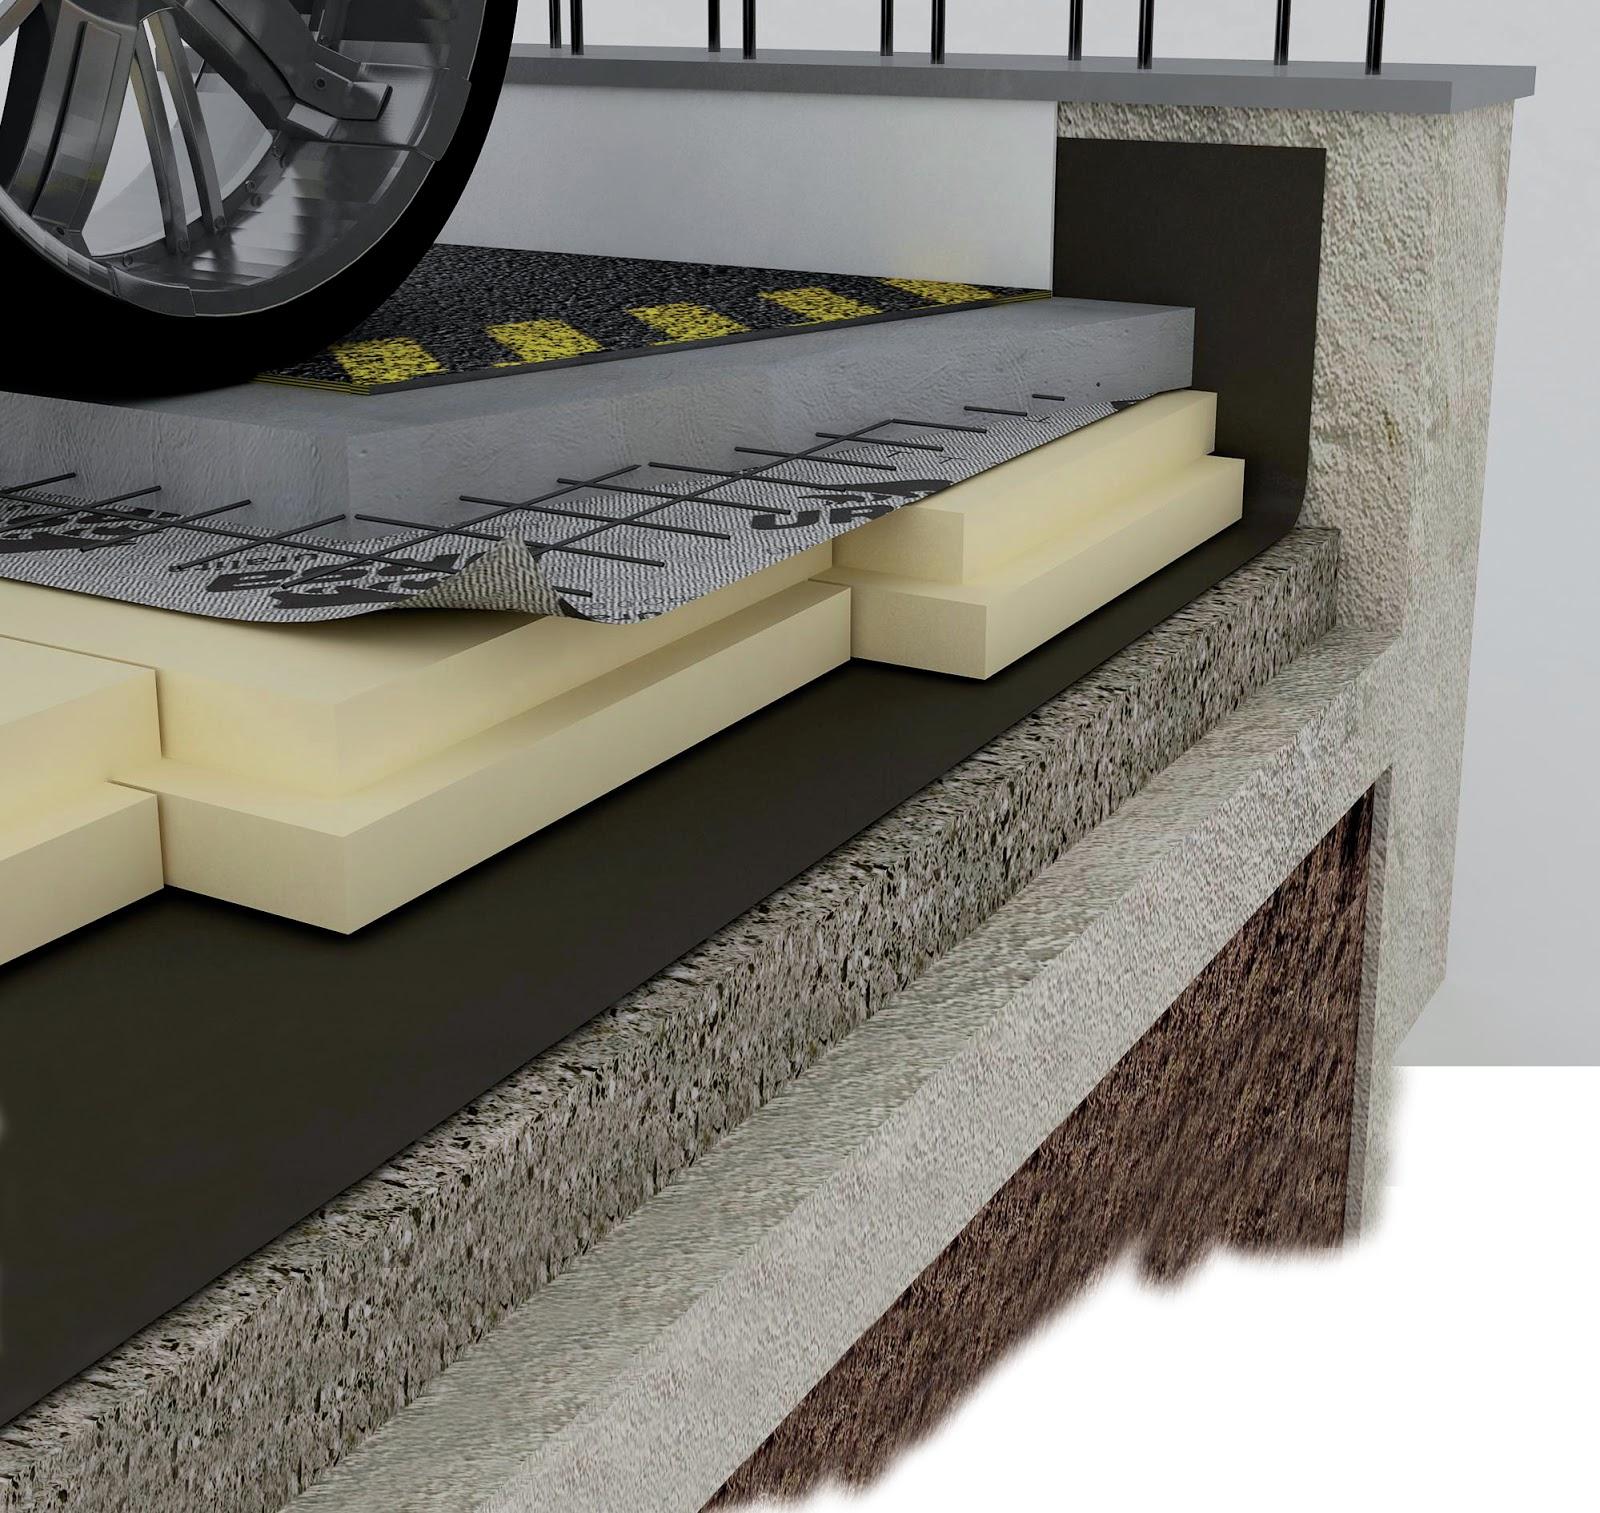 zona confortzona confort. Black Bedroom Furniture Sets. Home Design Ideas